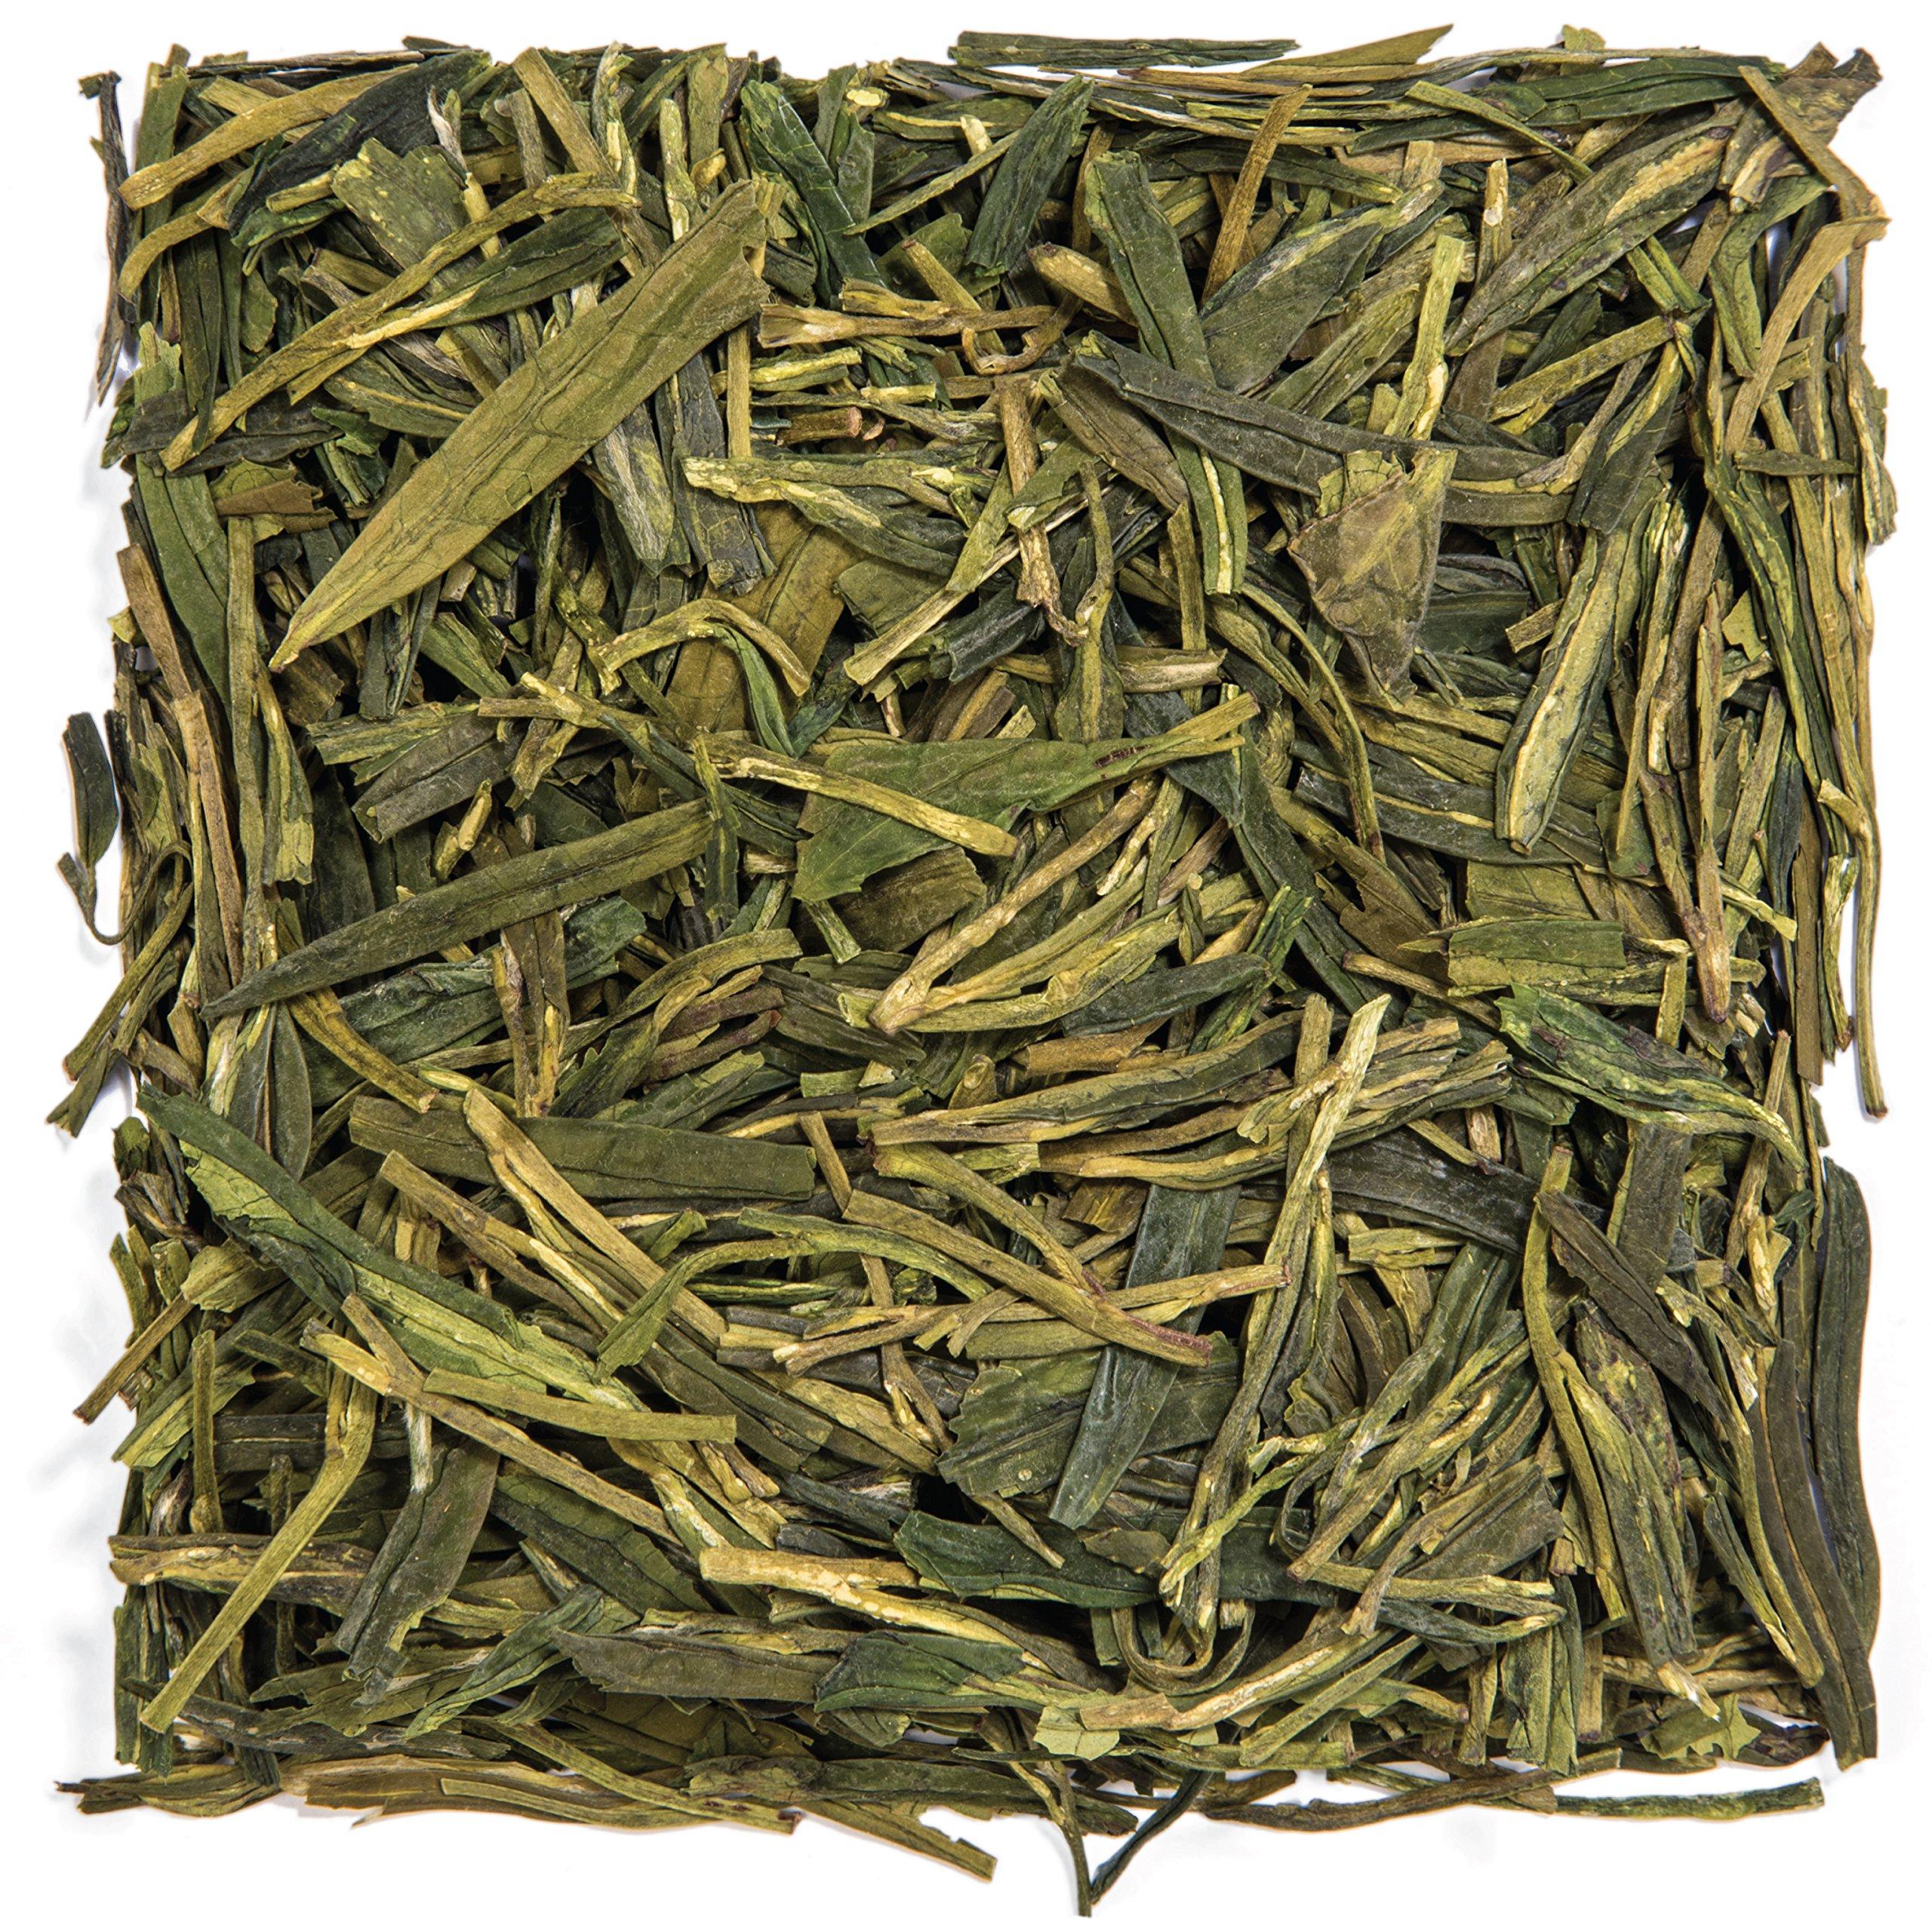 Tealyra - Premium Dragon Well - Long Jing - Green Tea - Best Chinese Loose Leaf Tea - First Grade - 200-gram